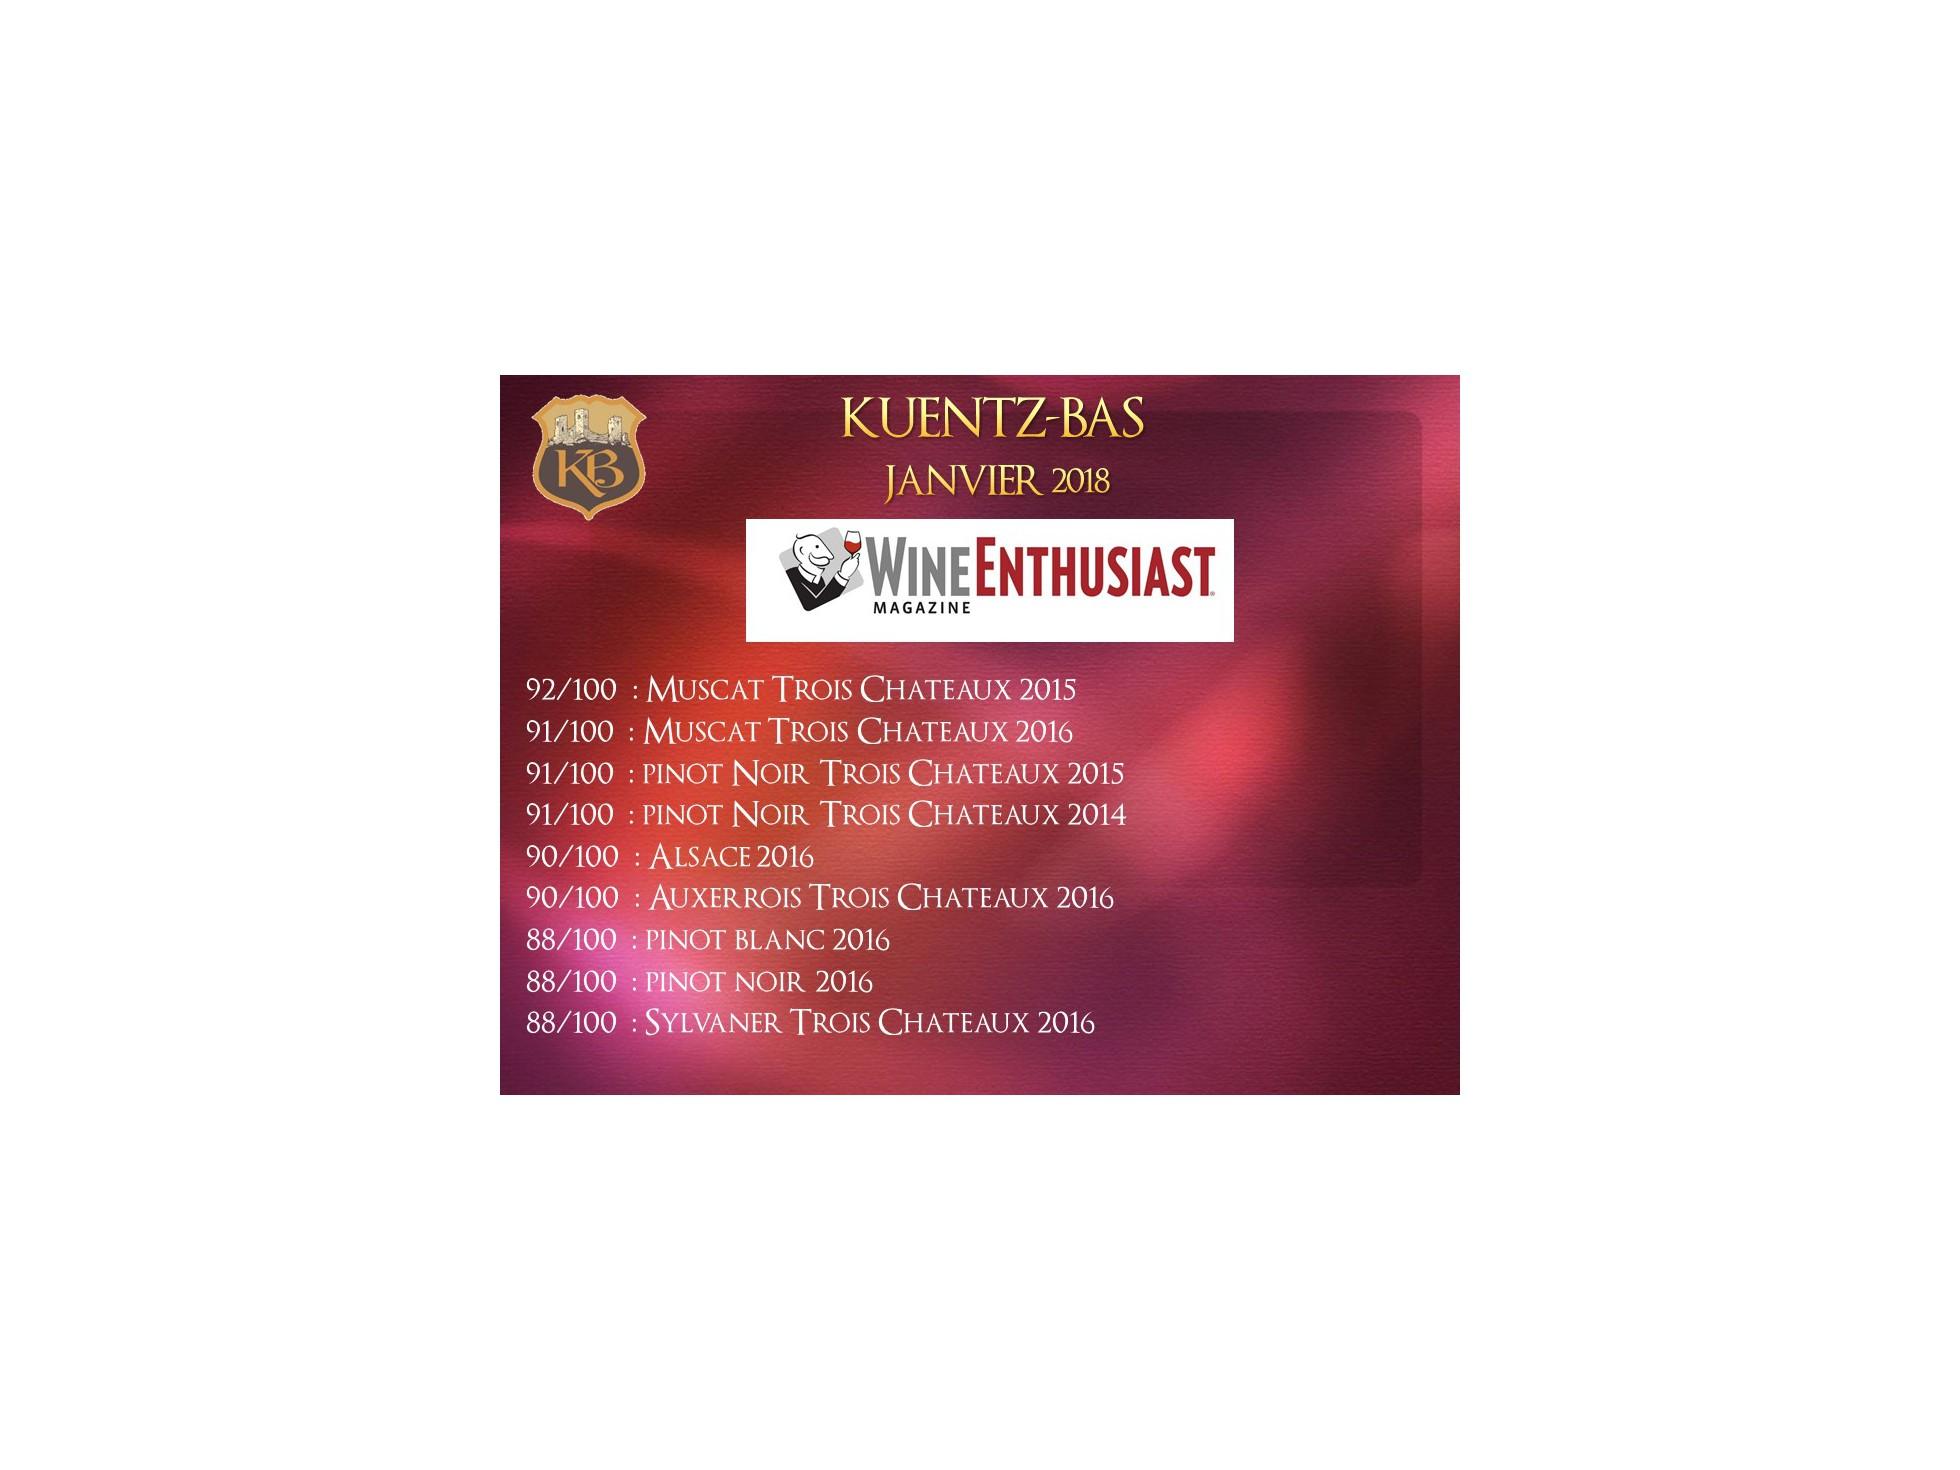 WINE ENTHUSIAST Janvier 2018